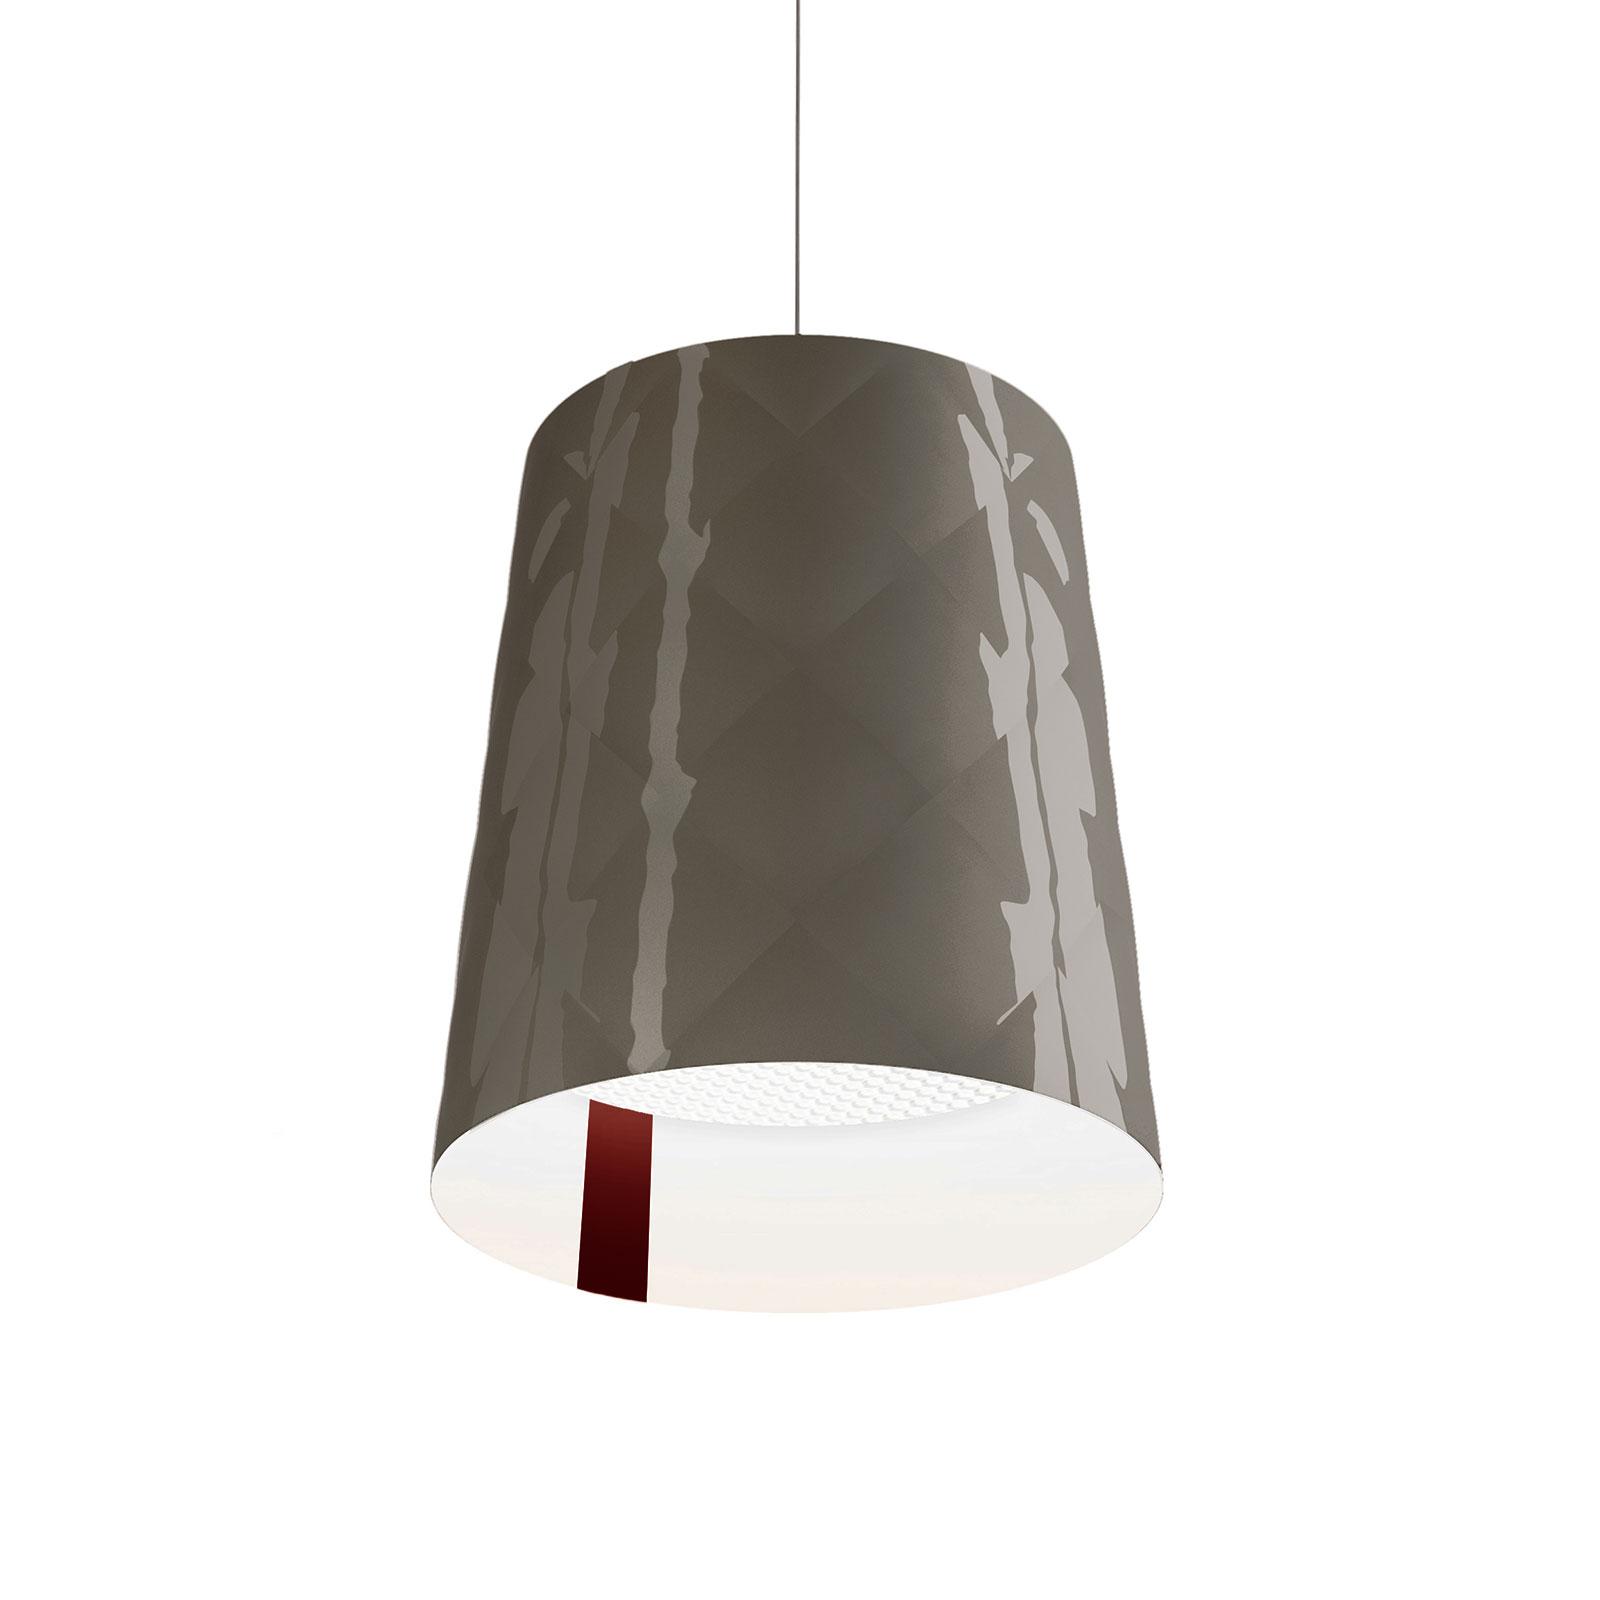 Kundalini New York hanglamp, Ø 33 cm, grijs